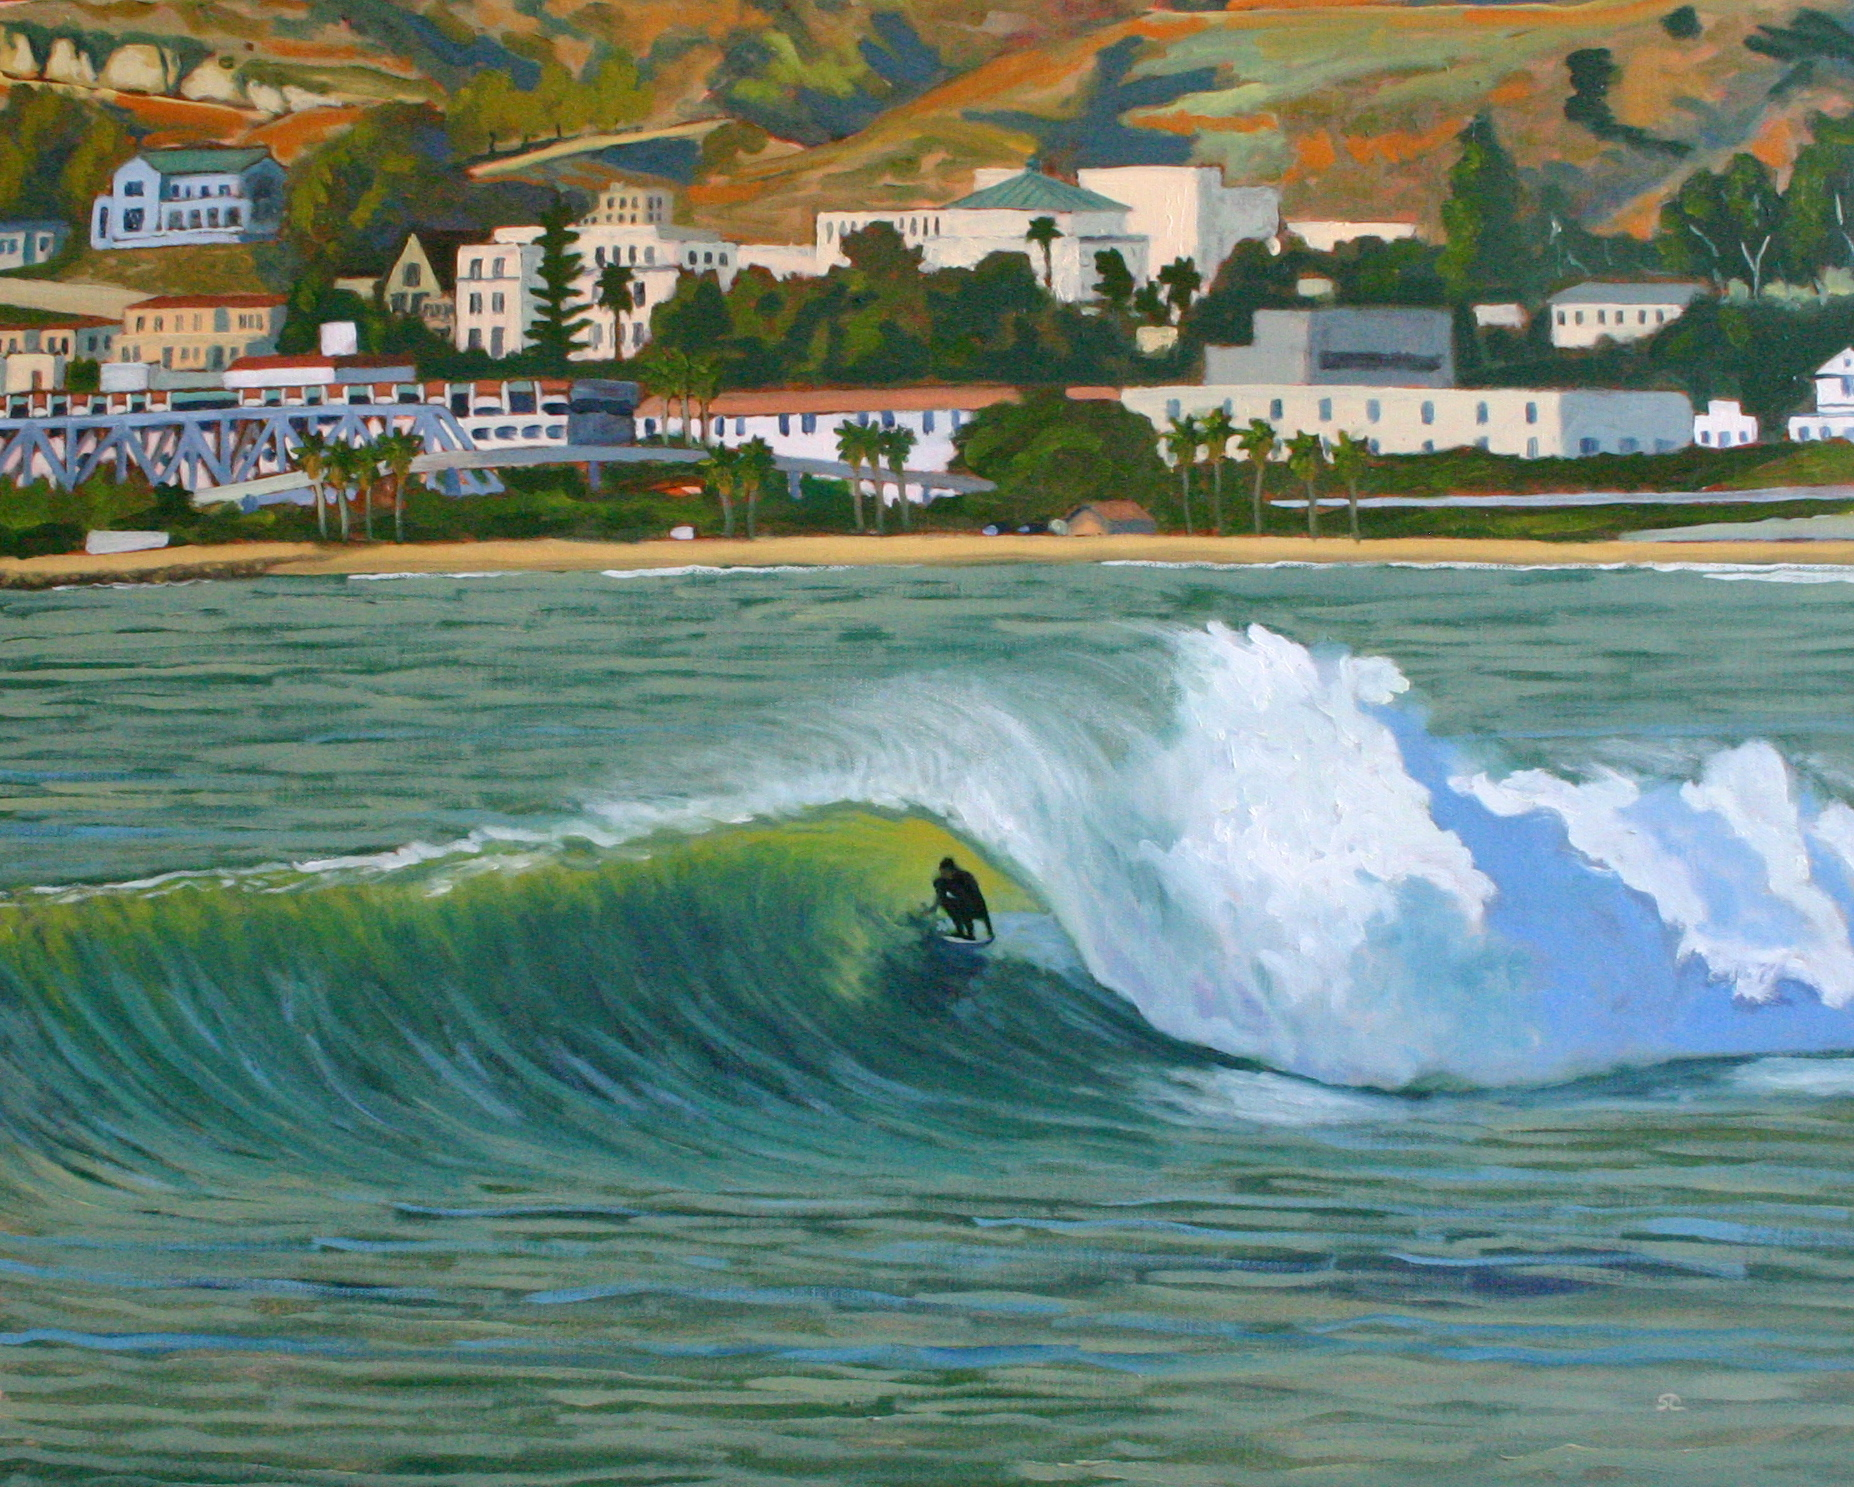 """Dredge Barrel"" oil on canvas 24 x 30, sold"